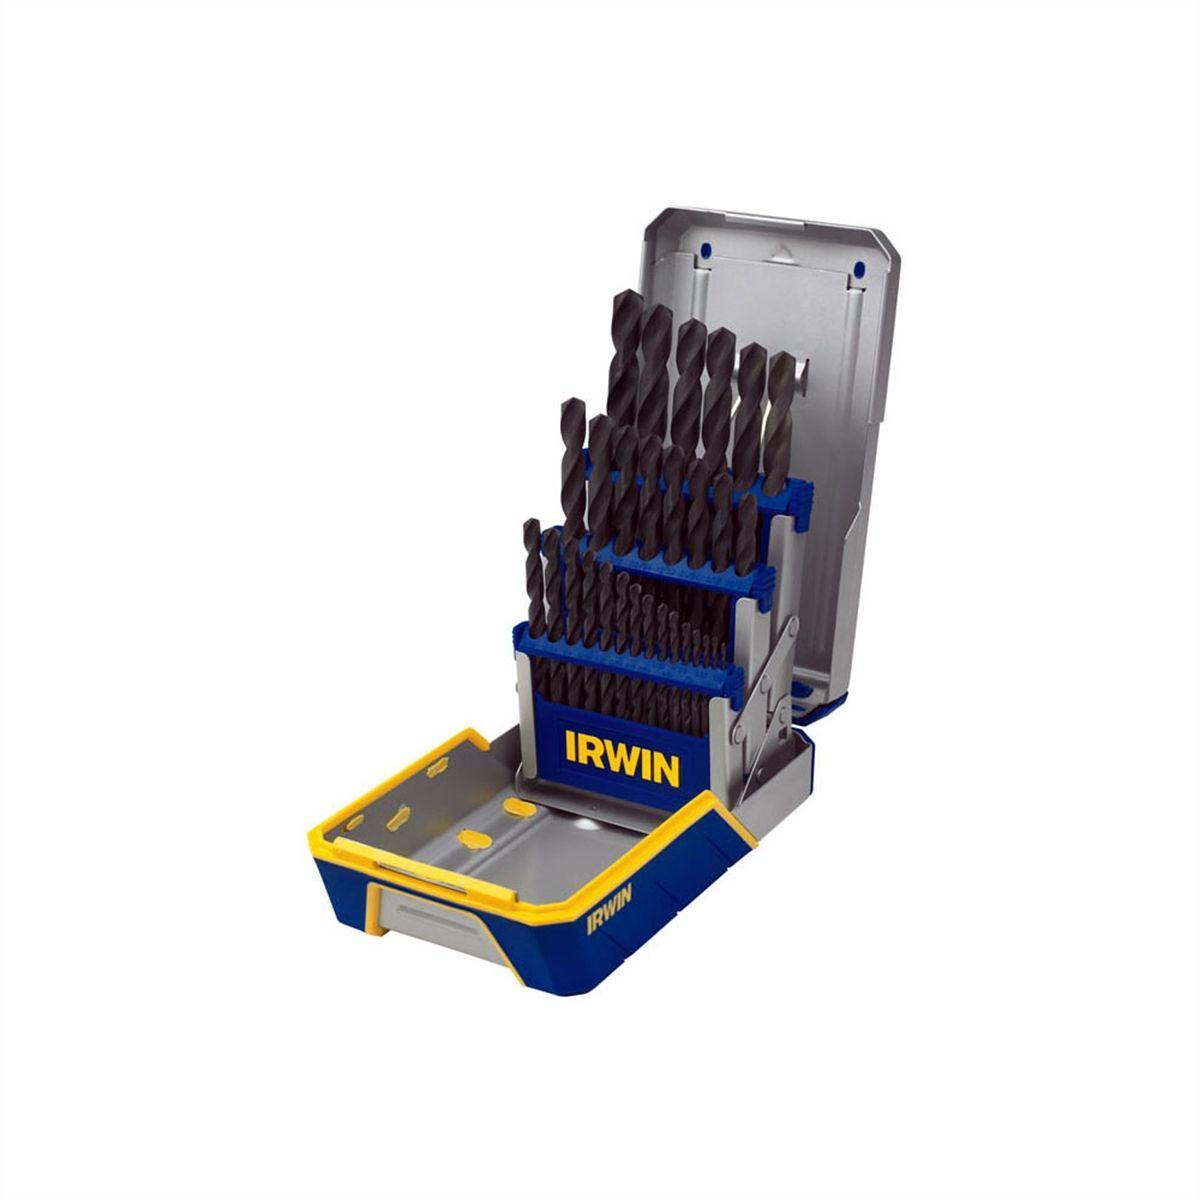 118 point Black oxide 12 PCS 11//64  Irwin Fractional HSS Jobber Drill Bits